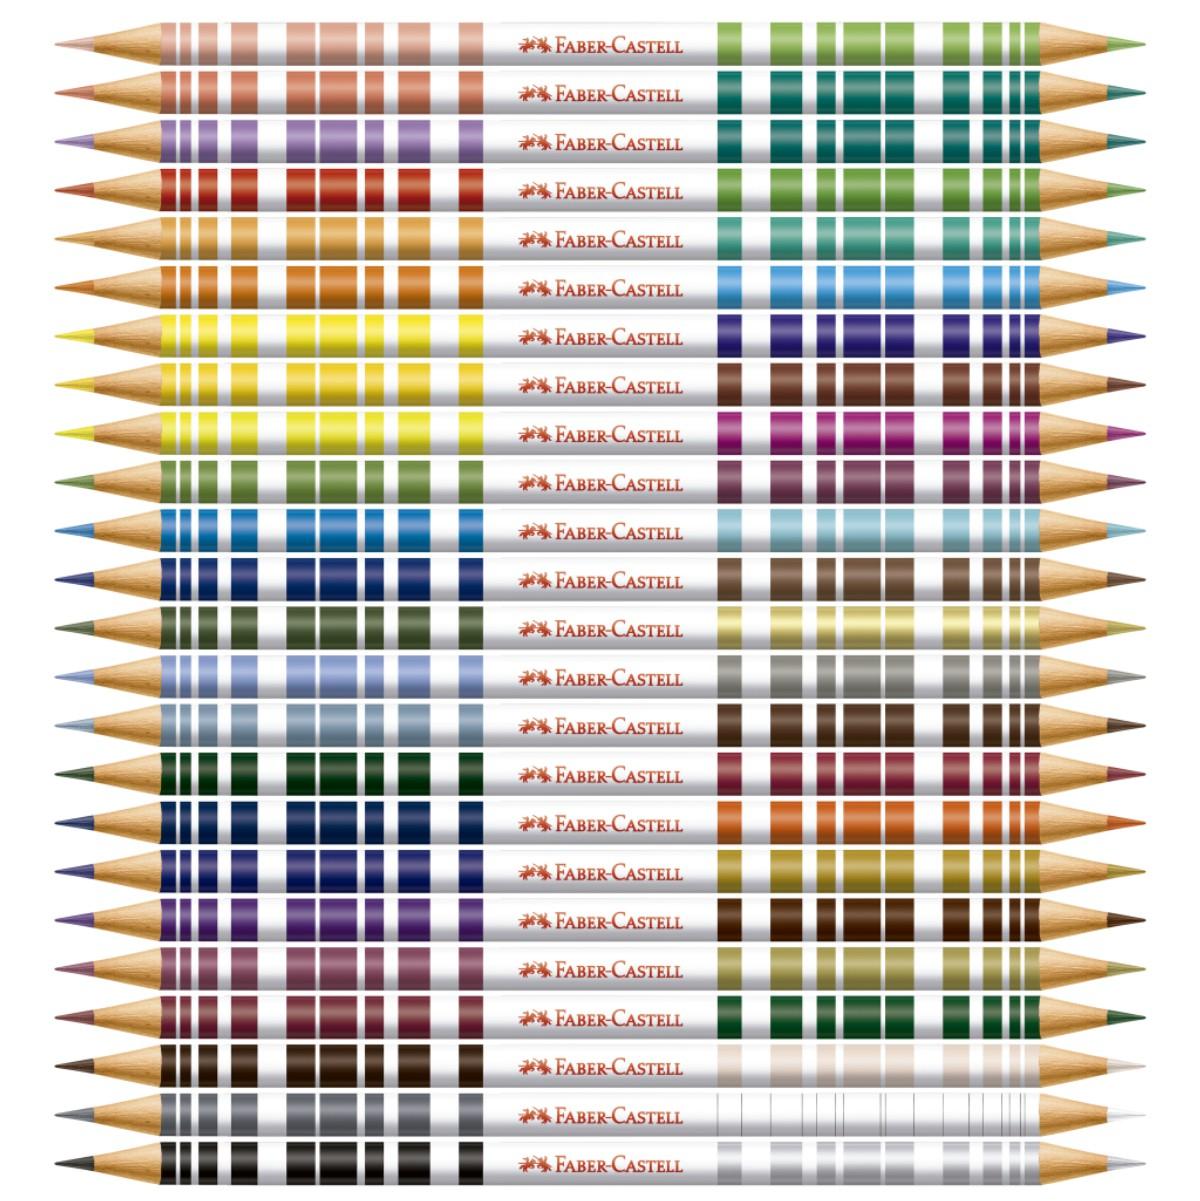 Lápis de Cor Faber Castell Bicolor 24 lápis e 48 Cores